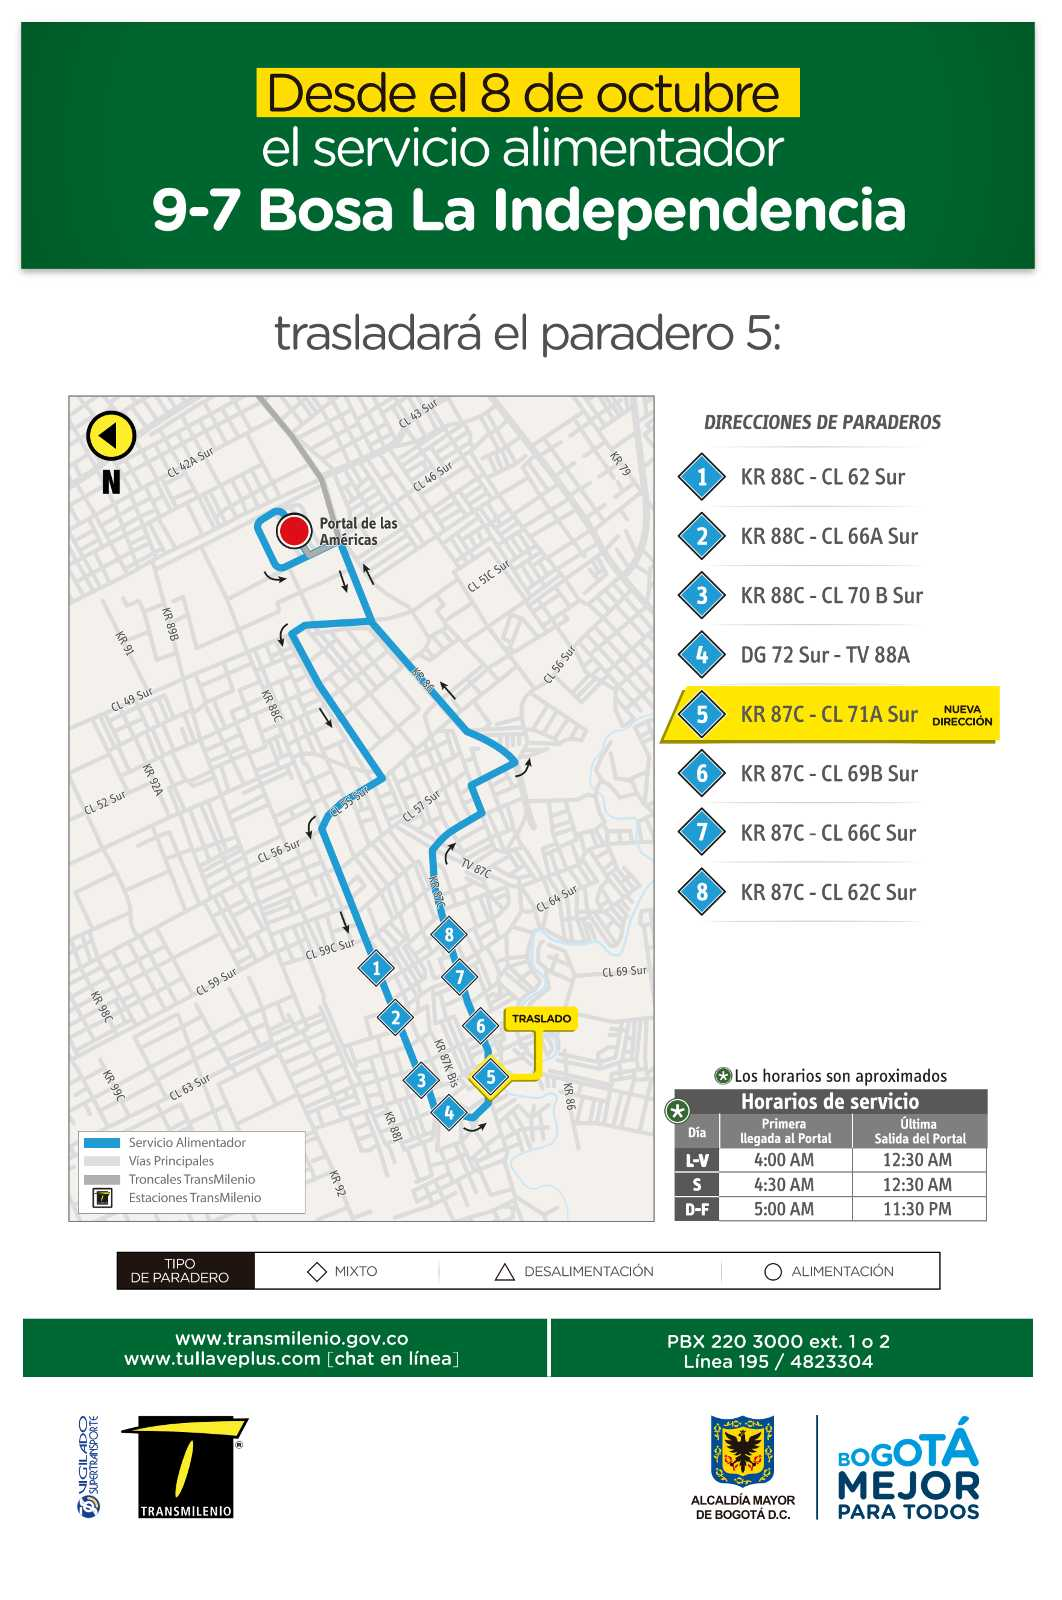 Mapa ruta alimentadora 9-7 Bosa La Independencia